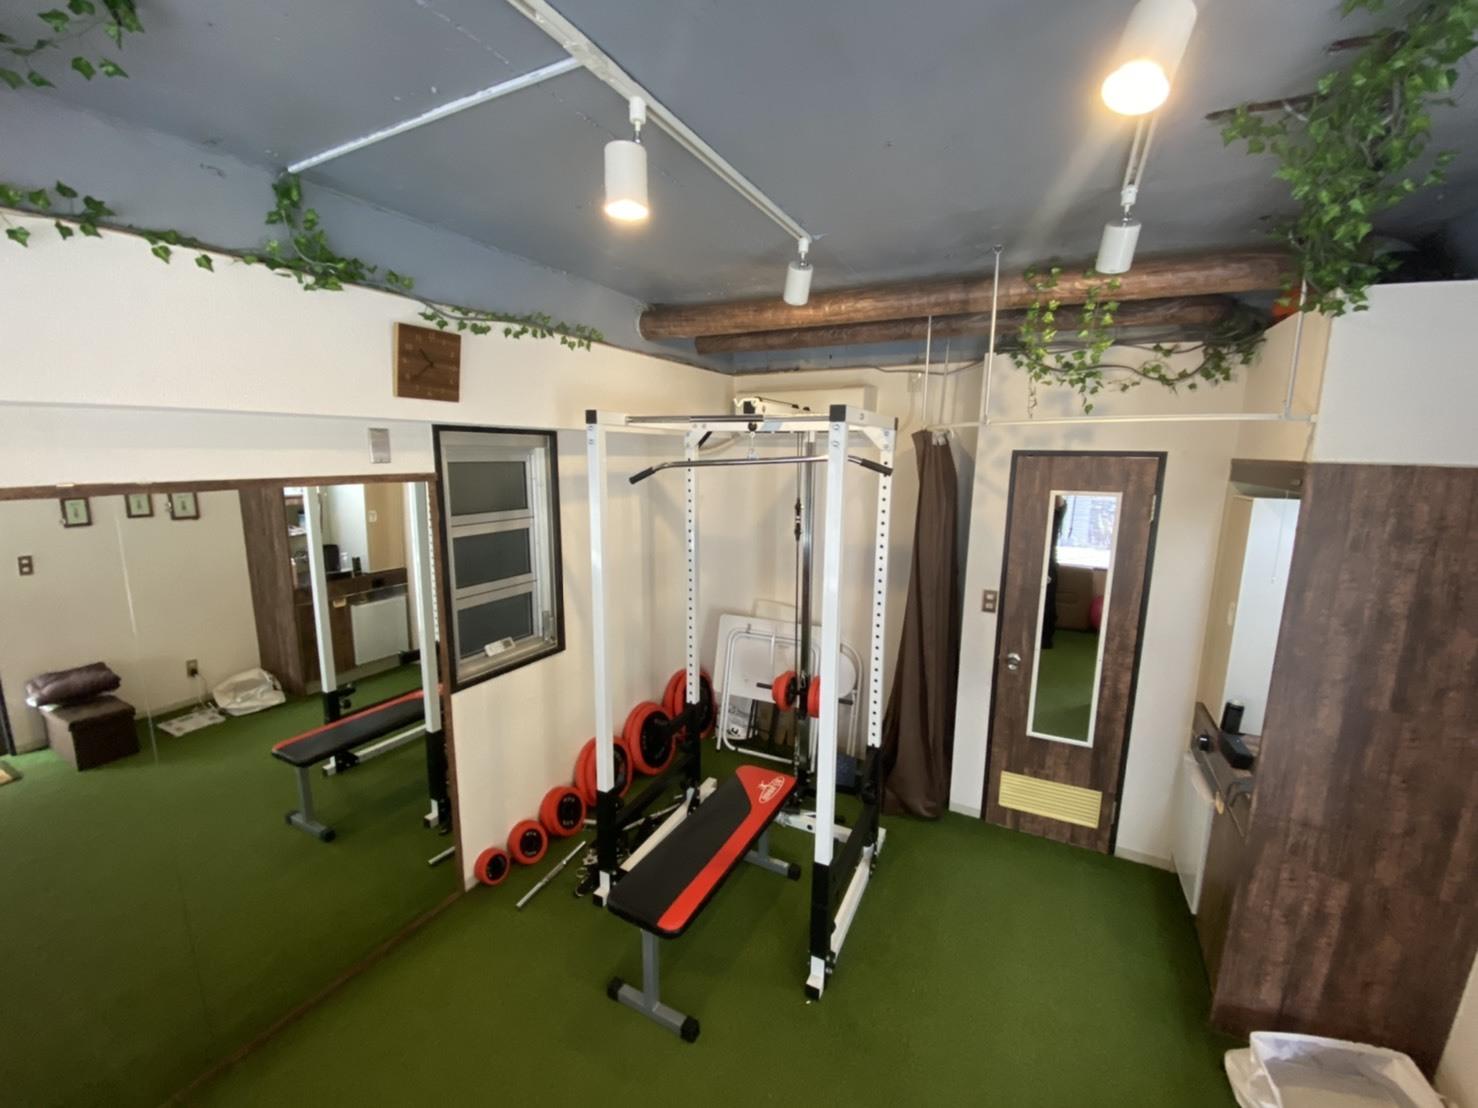 LiMEレンタルジム 市ヶ谷 レンタルジムの室内の写真